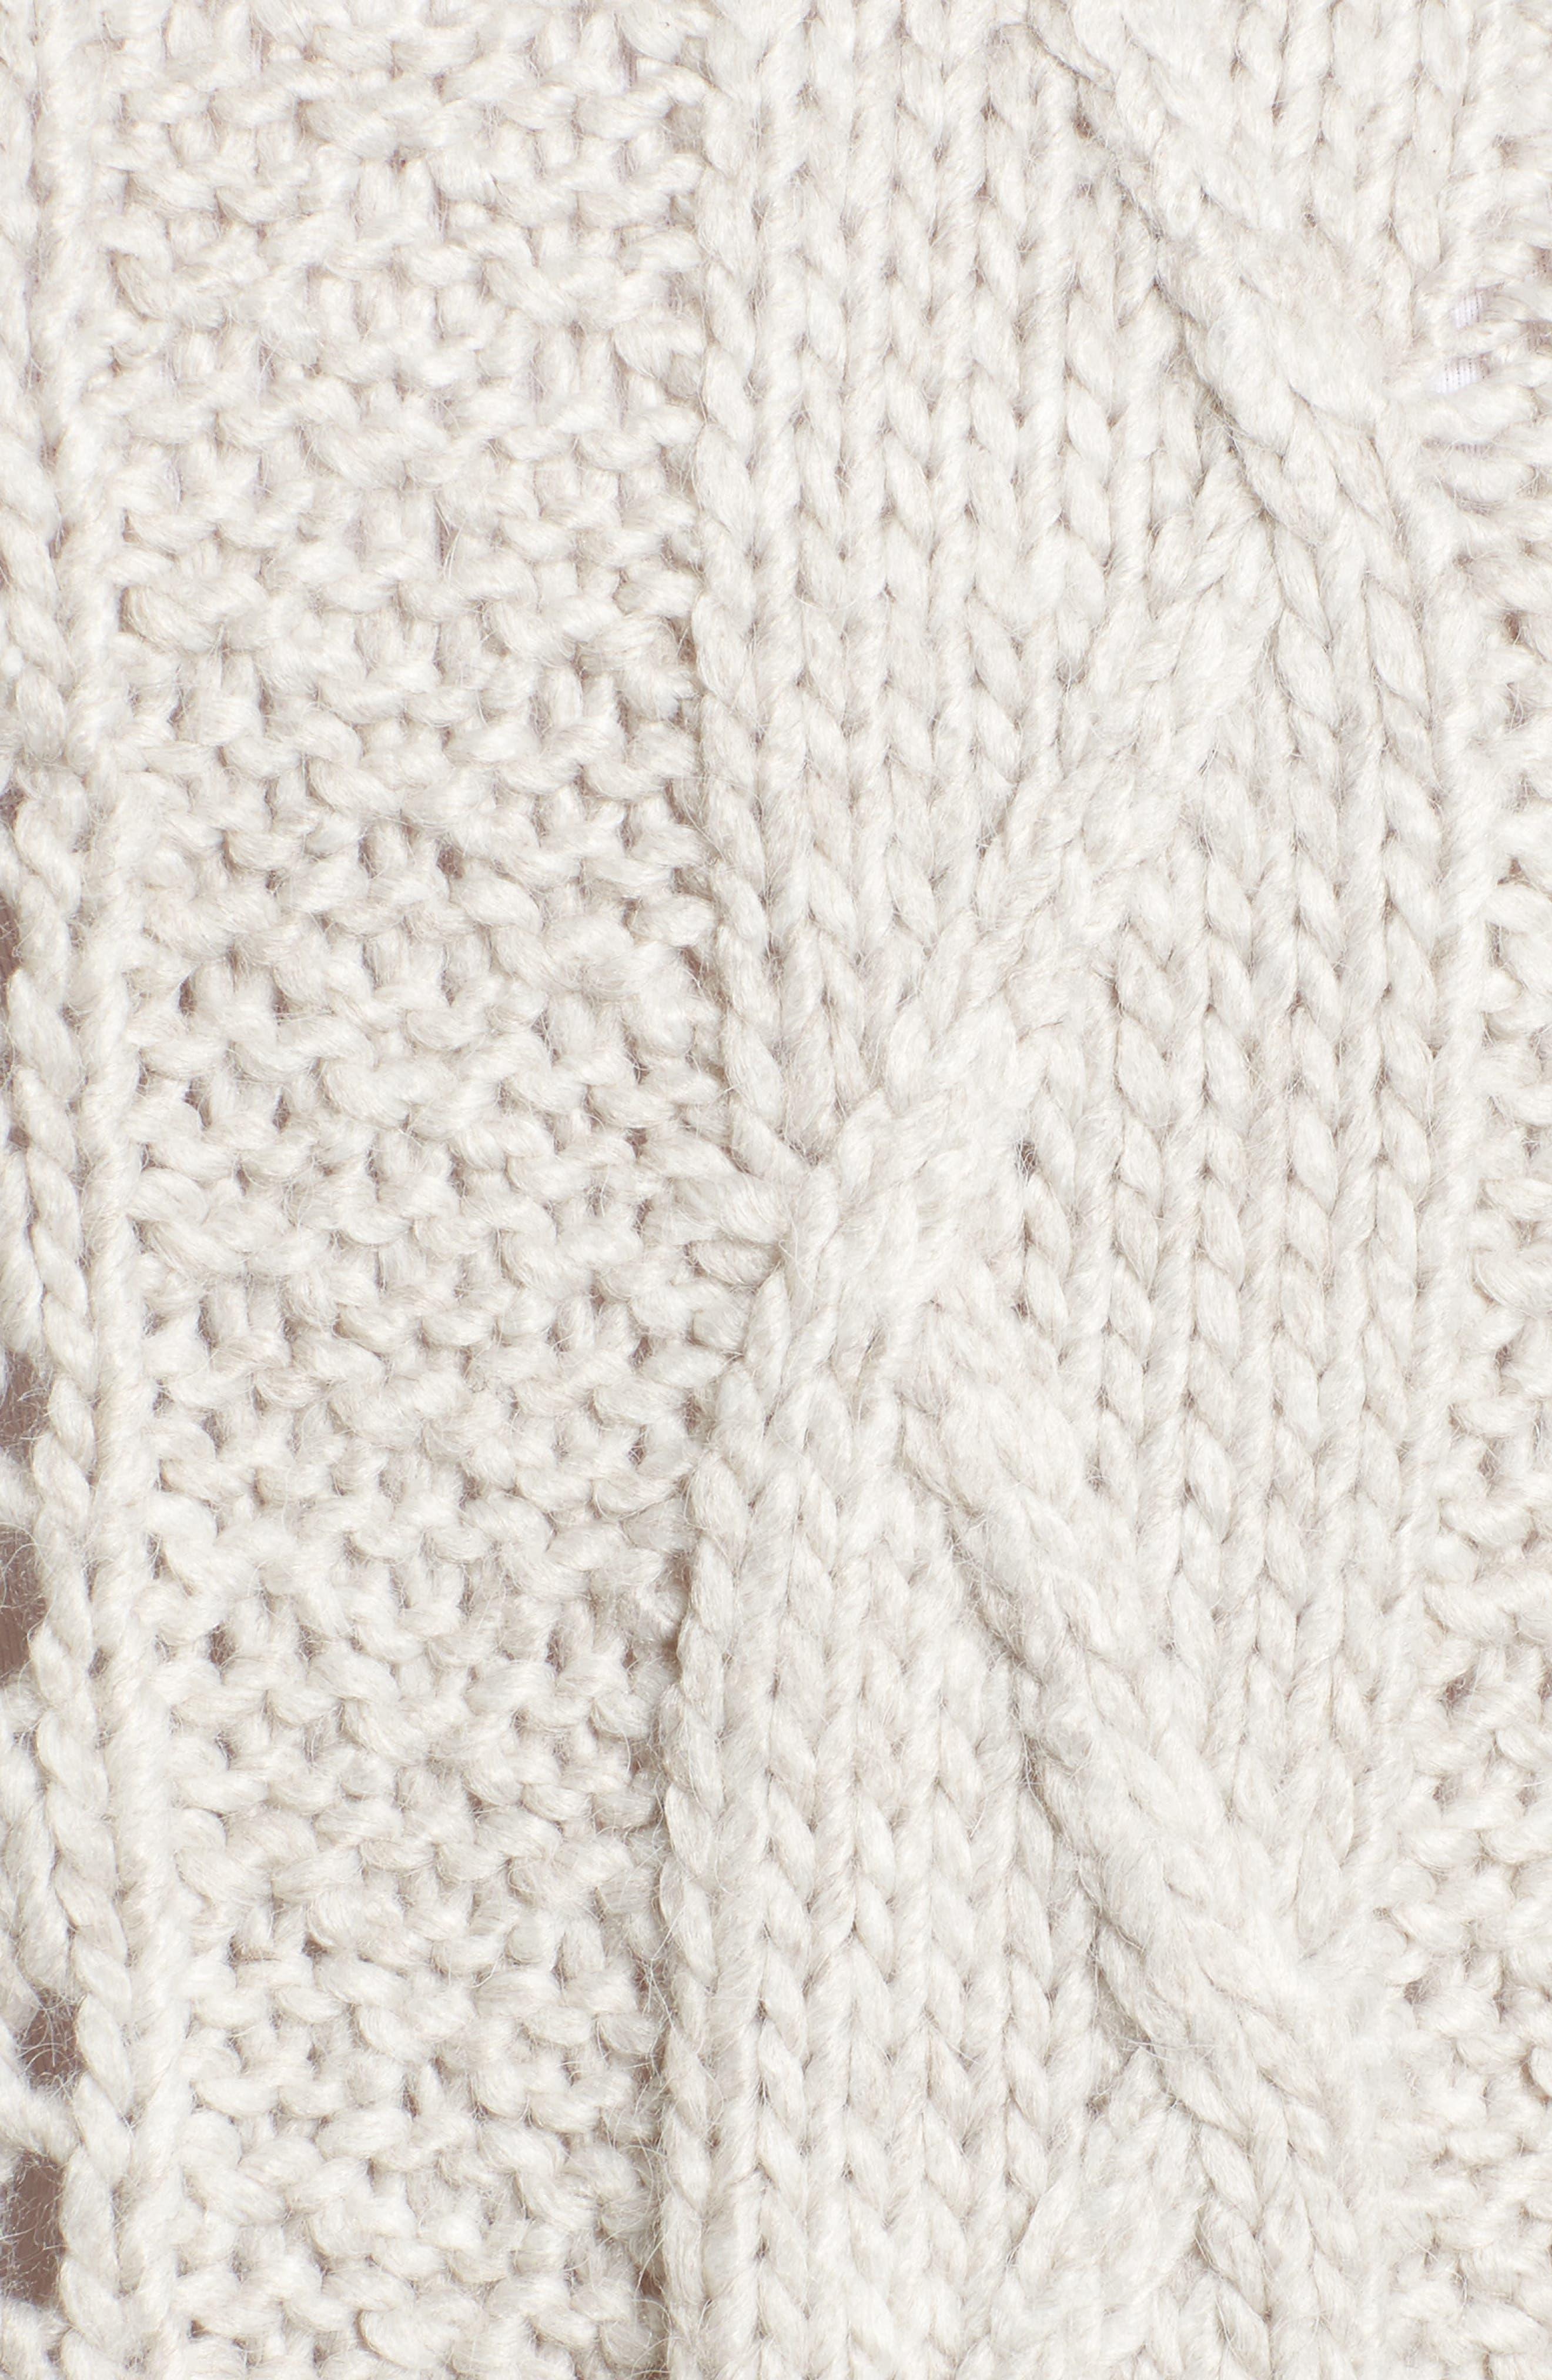 Prilla Fringe Cowl Neck Sweater,                             Alternate thumbnail 5, color,                             Latte